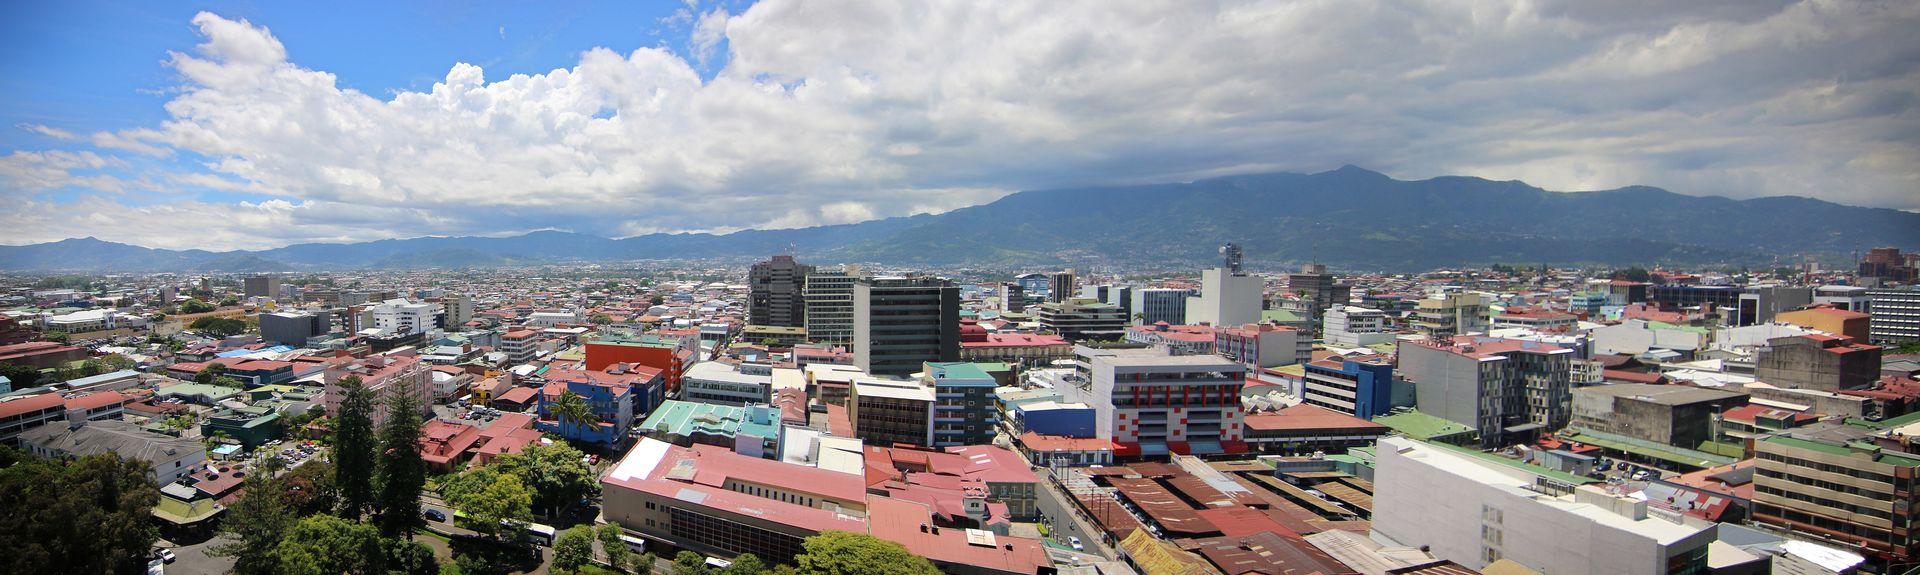 San José, San José, Costa Rica